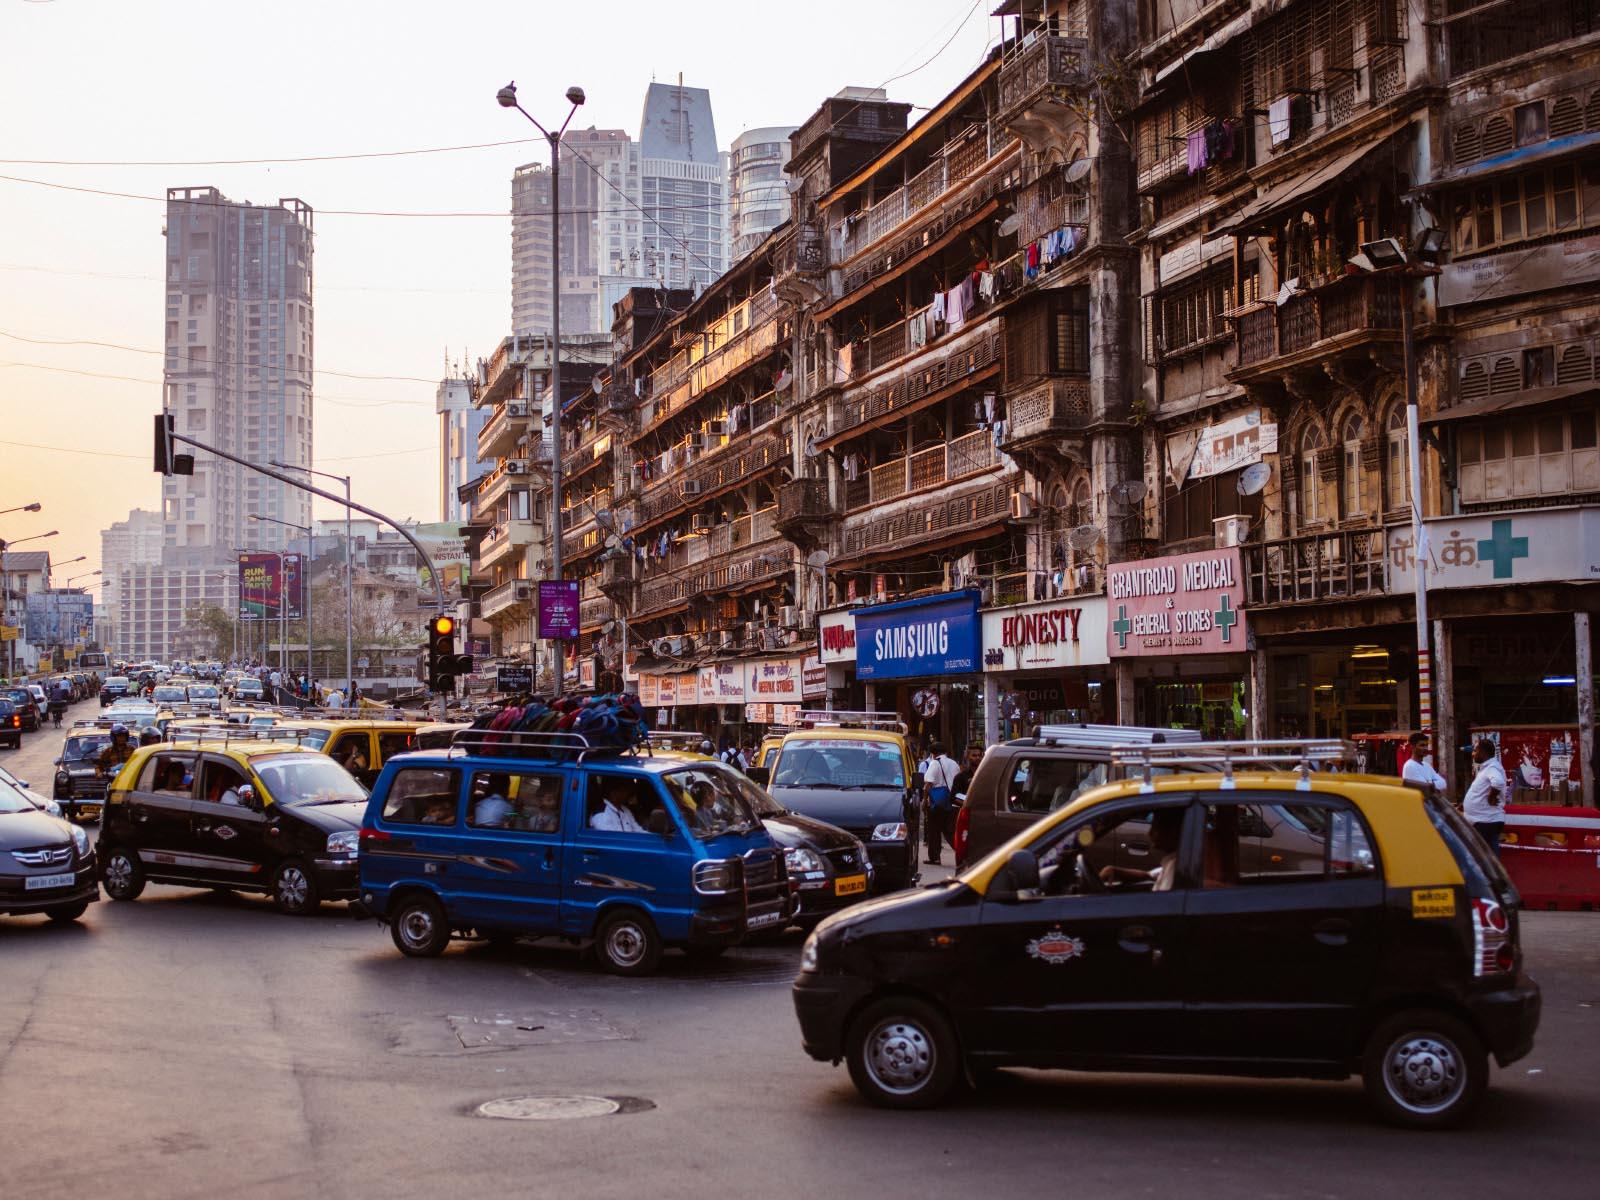 india-travel-photography-09.jpg